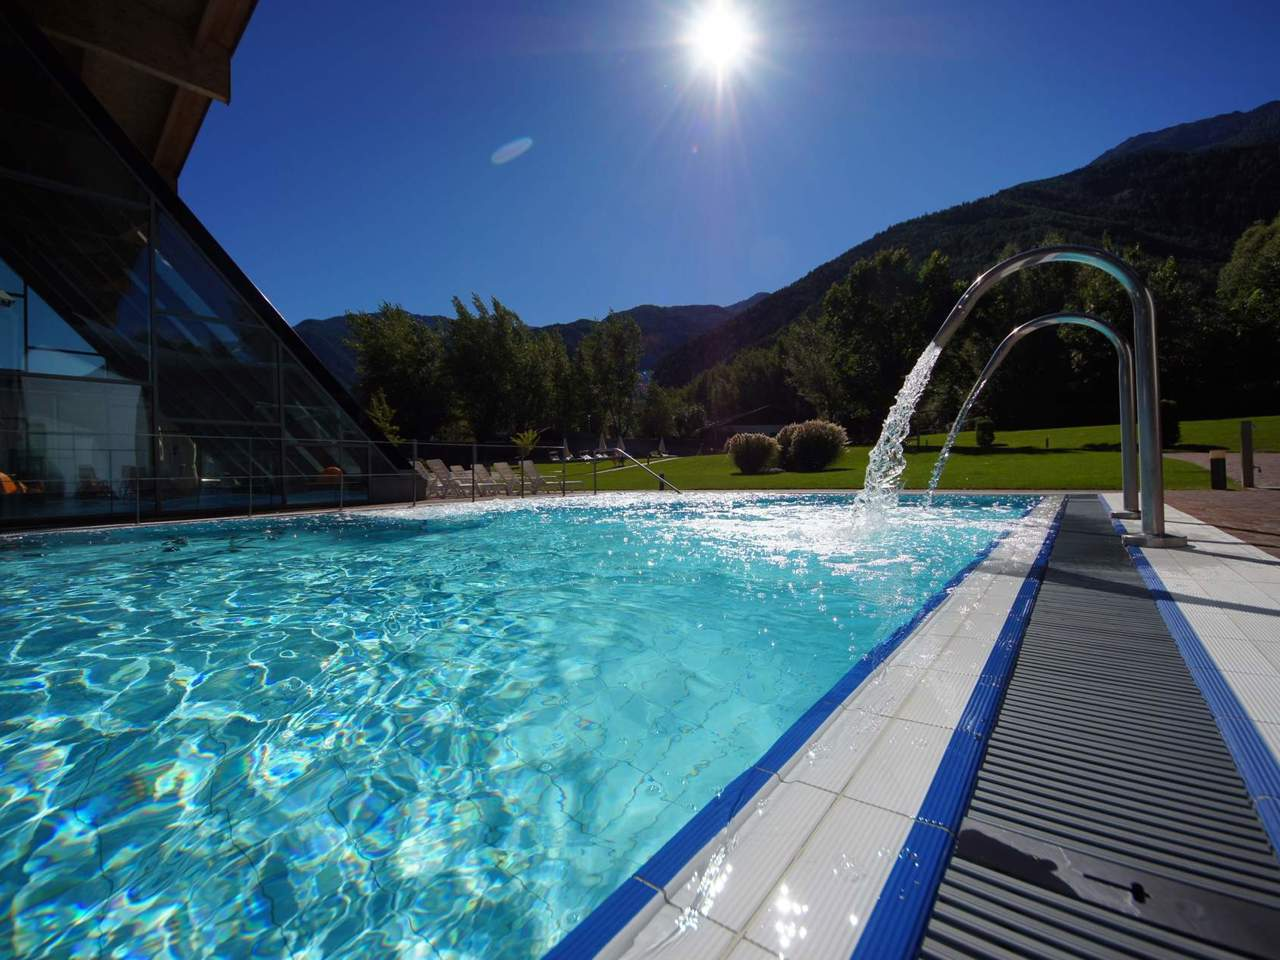 La piscina acquaforum a laces alto adige - Piscine alto adige ...